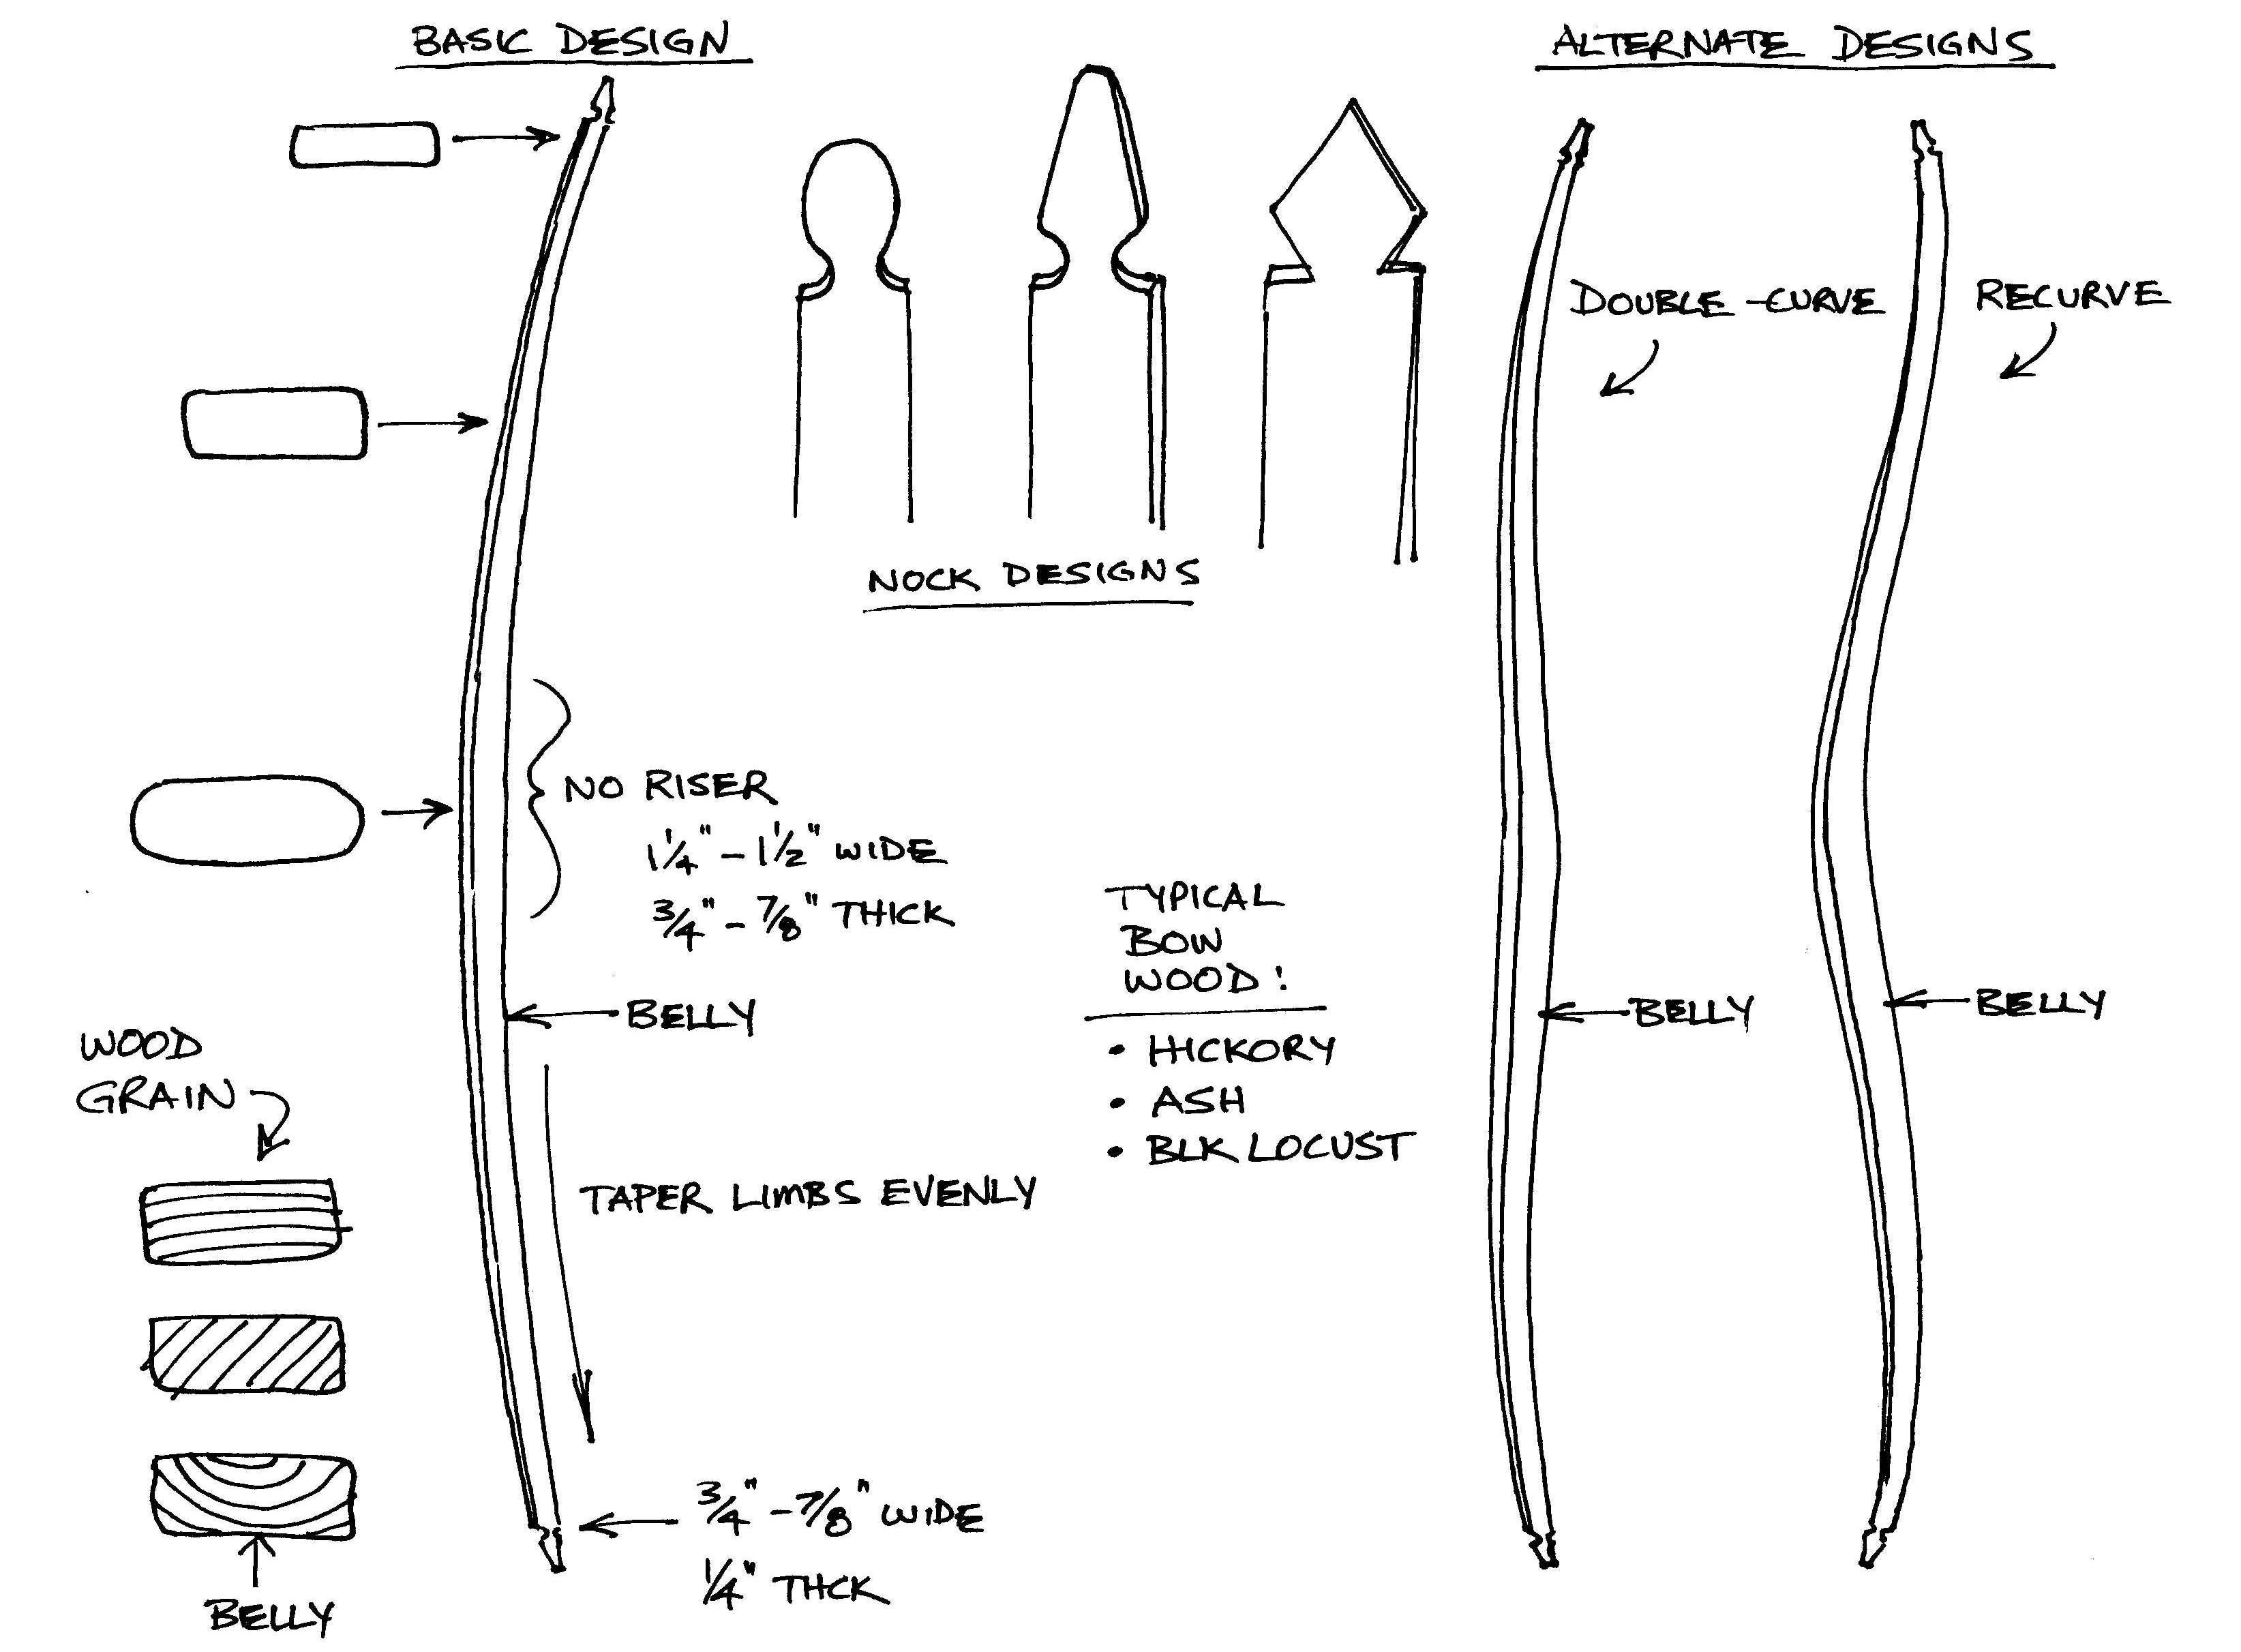 Woodland Indian Bow | Archery | Pinterest | Woodland indians ...